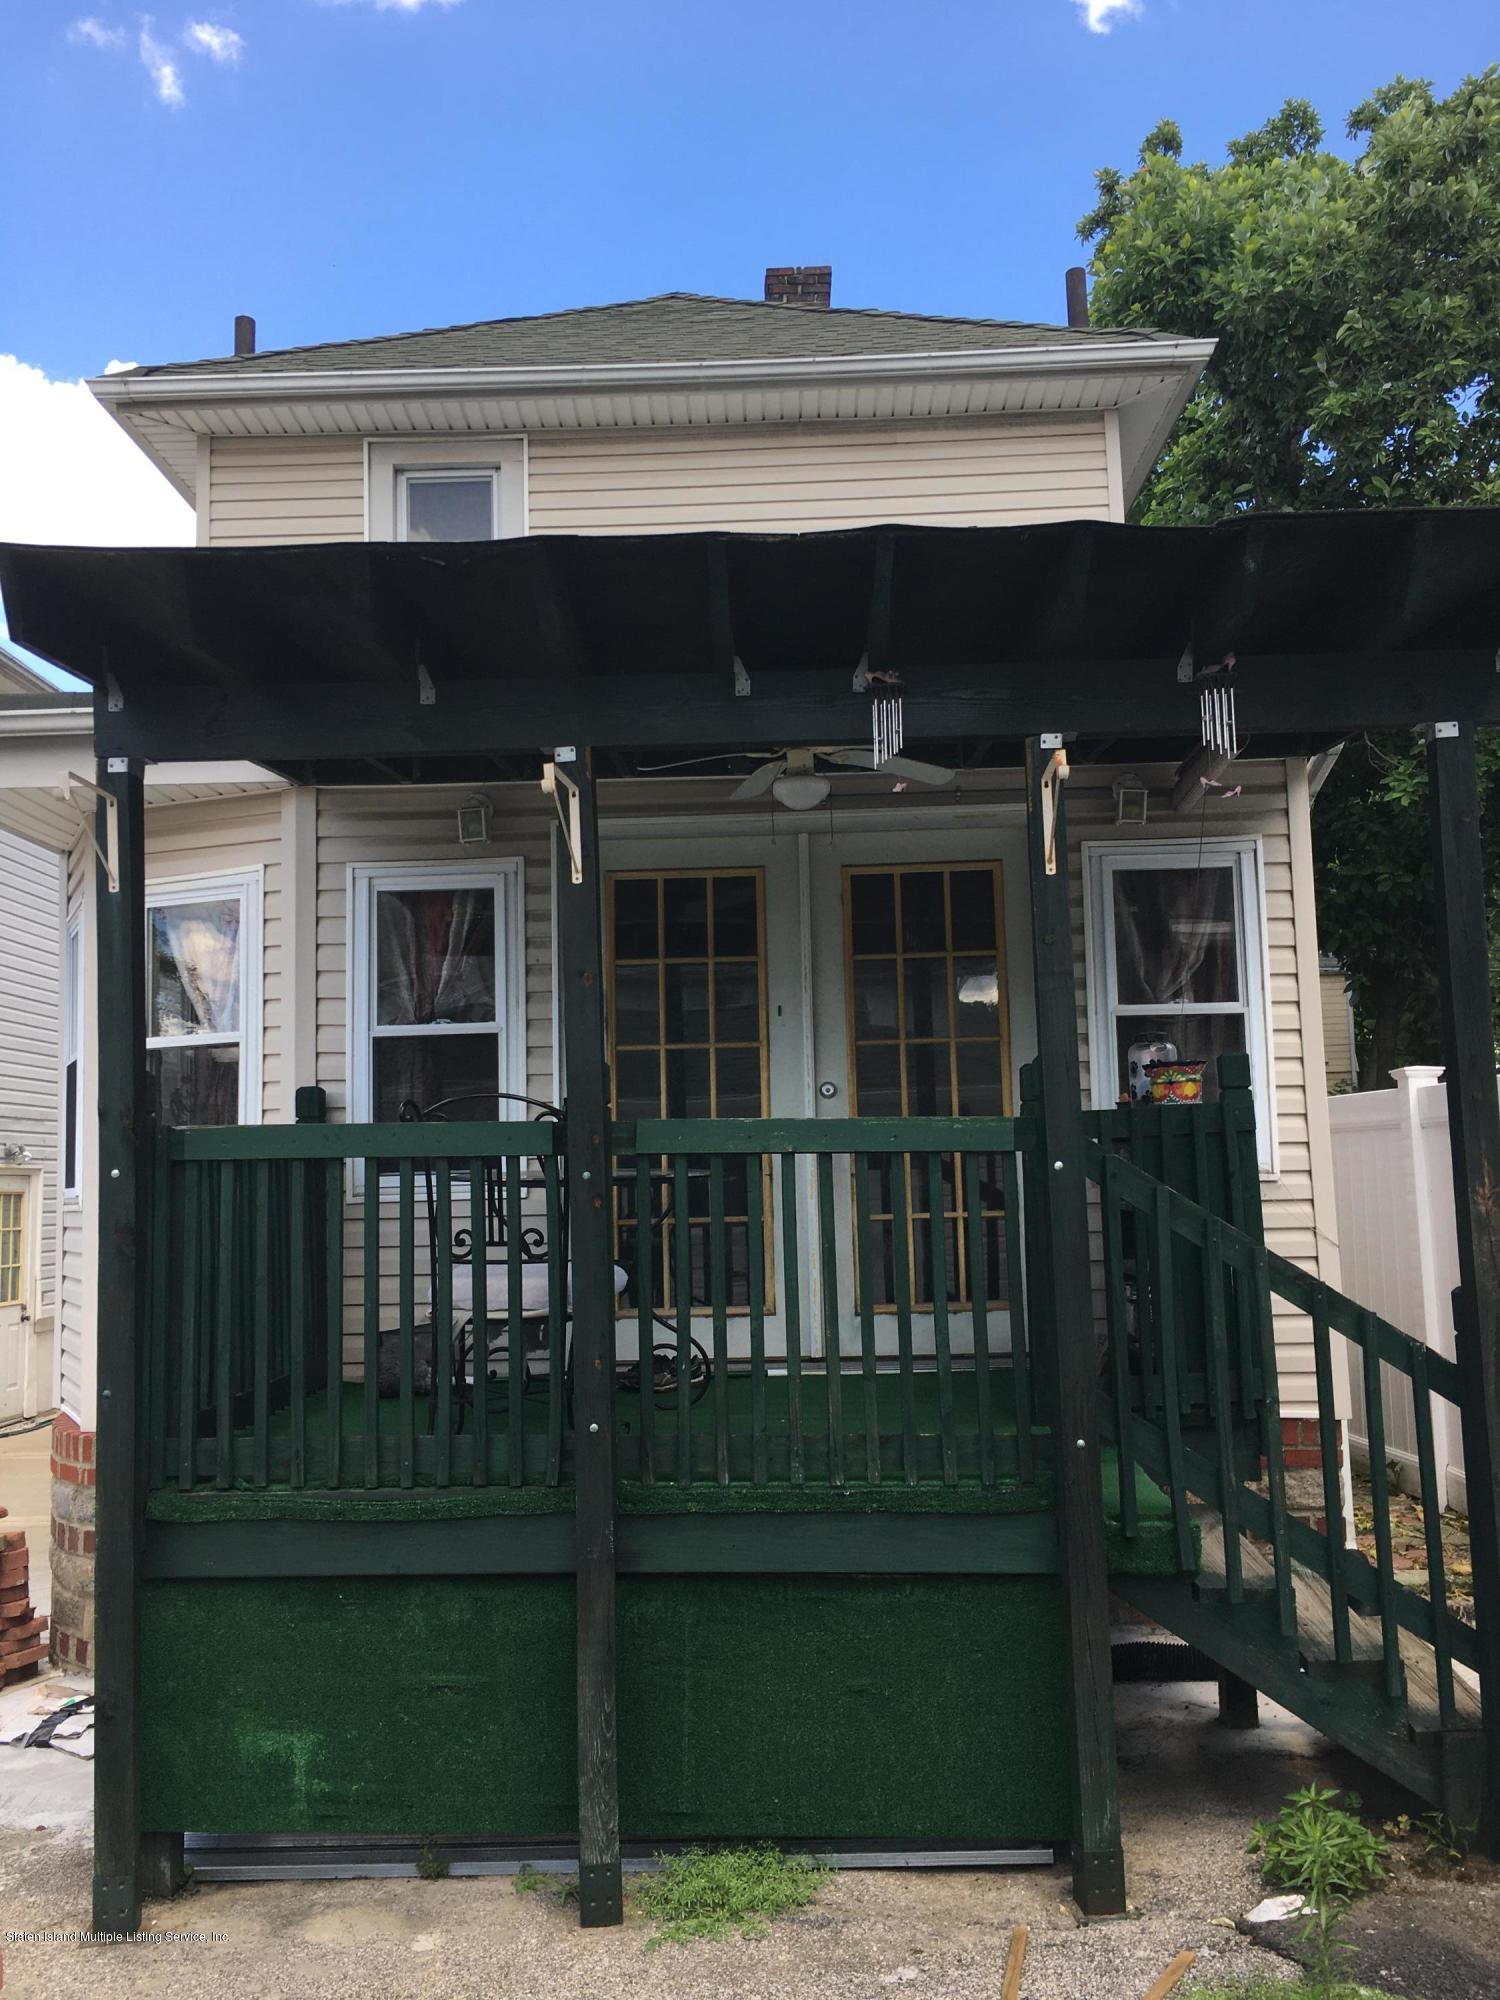 Single Family - Detached 56 Veltman Avenue  Staten Island, NY 10302, MLS-1138531-21